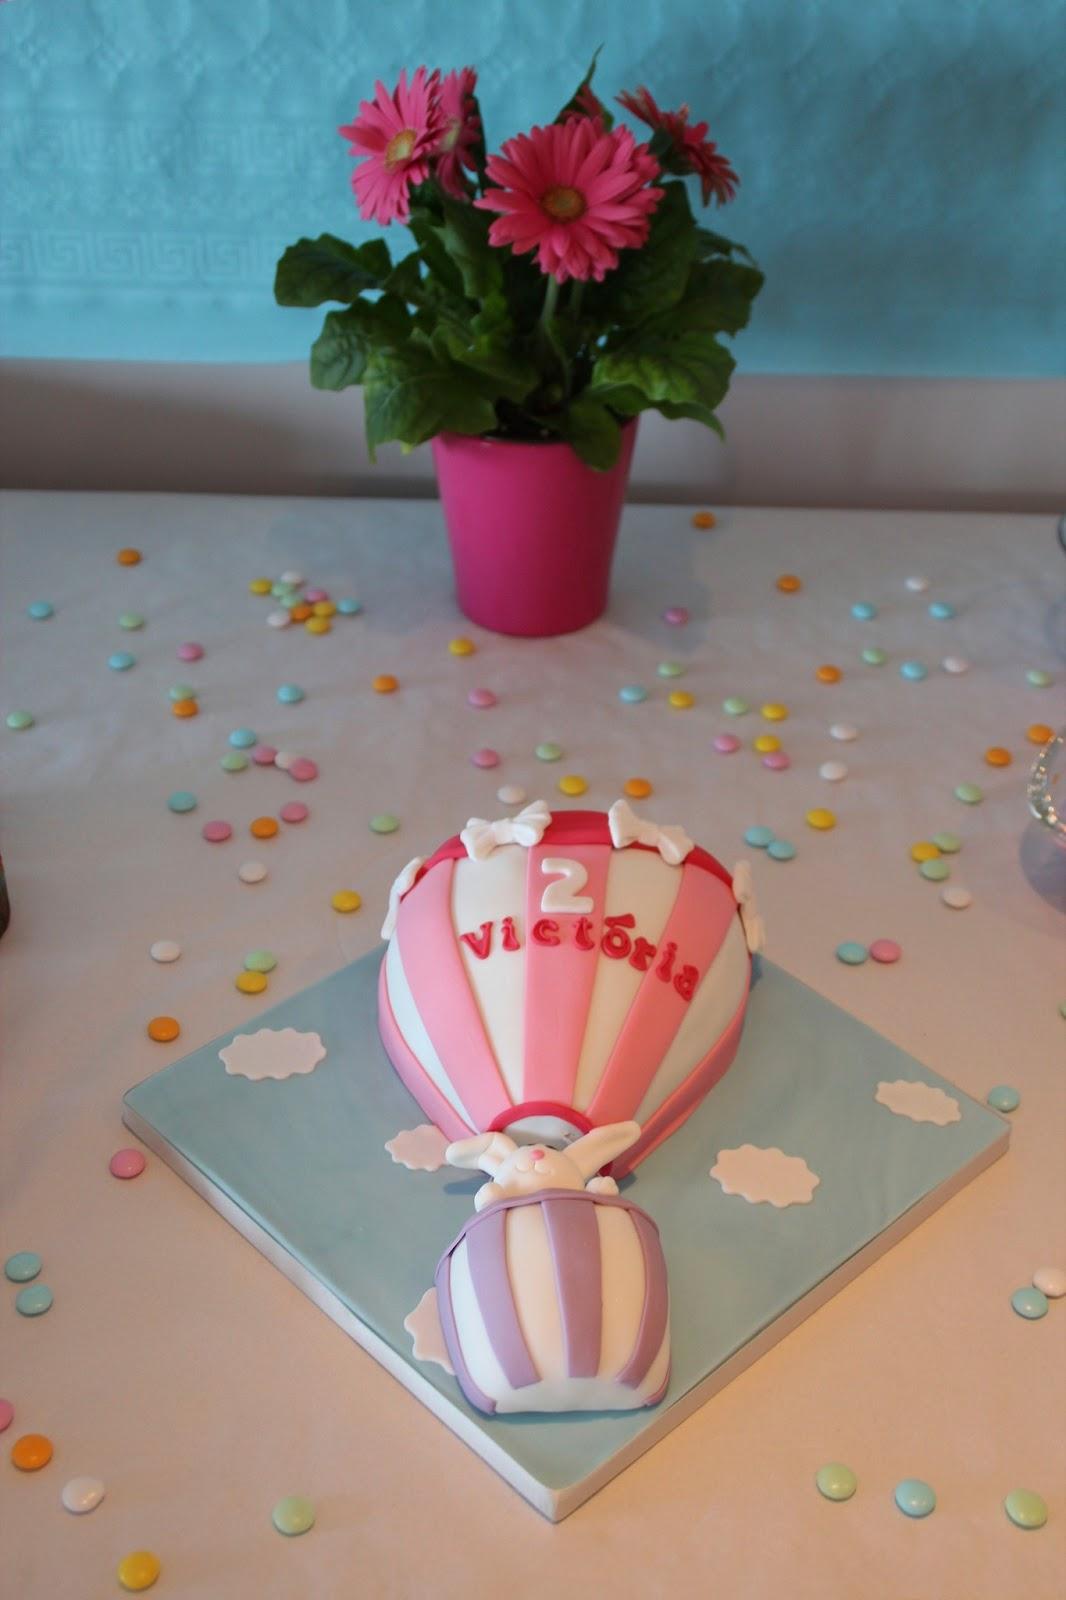 gâteau victoria rose forme montgolfière